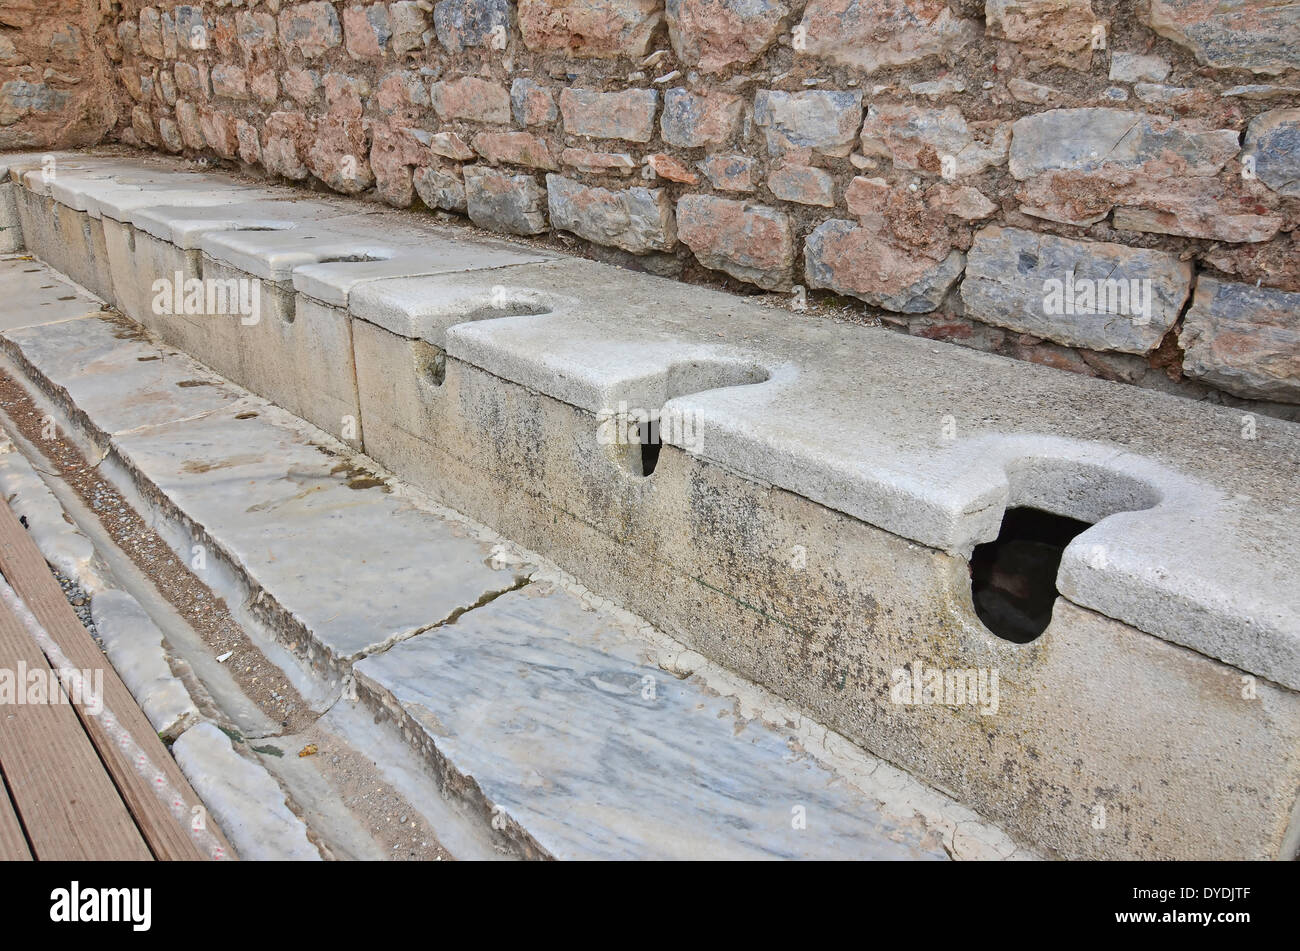 toilet latrine wc bog public toilets long drop john evacuation crap crapper defecation defecate relief dunny ancient Rome r - Stock Image